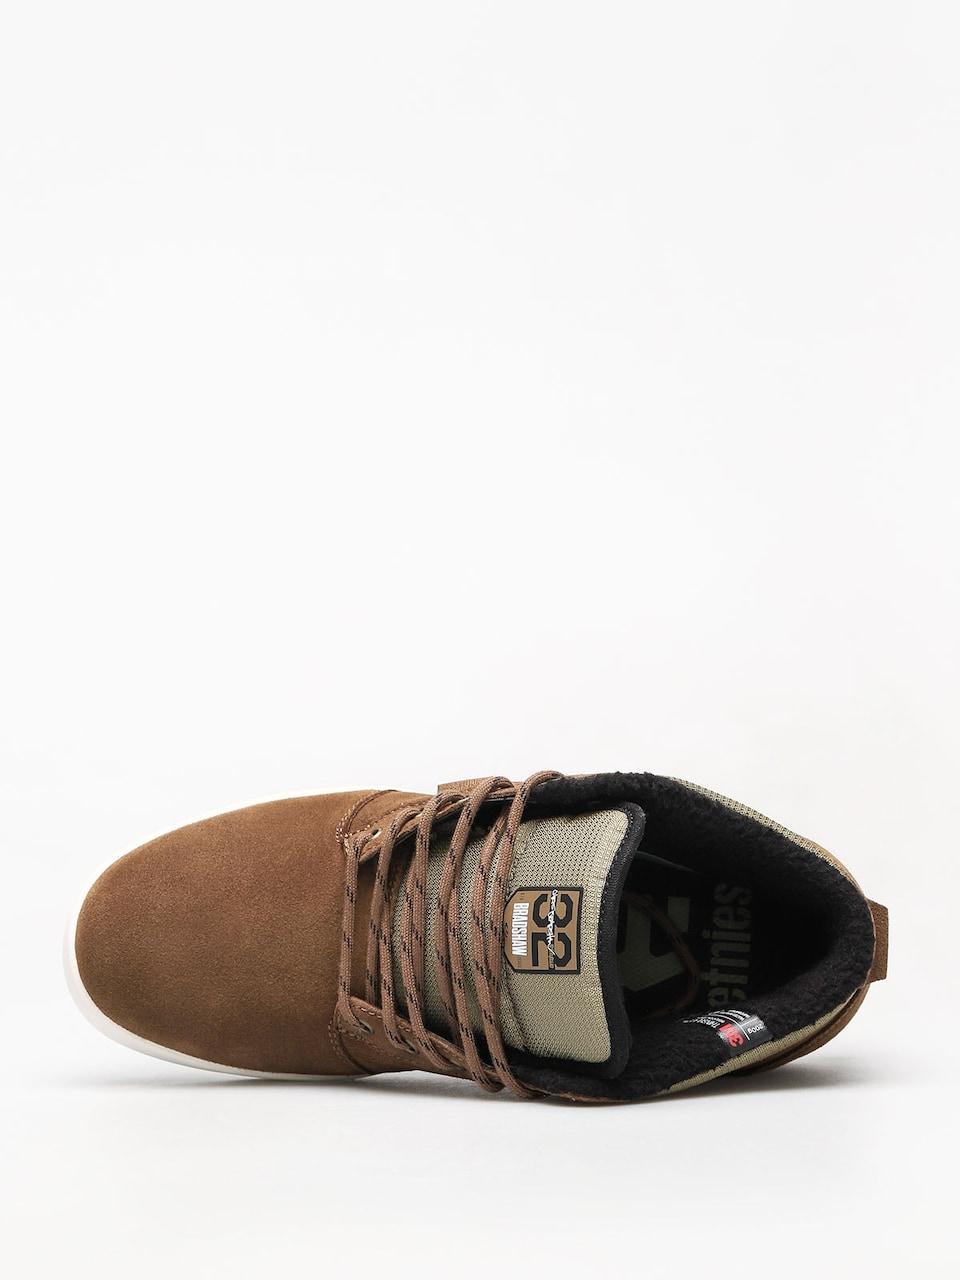 Brown Etnies Jefferson MTW x 32 Shoes Green